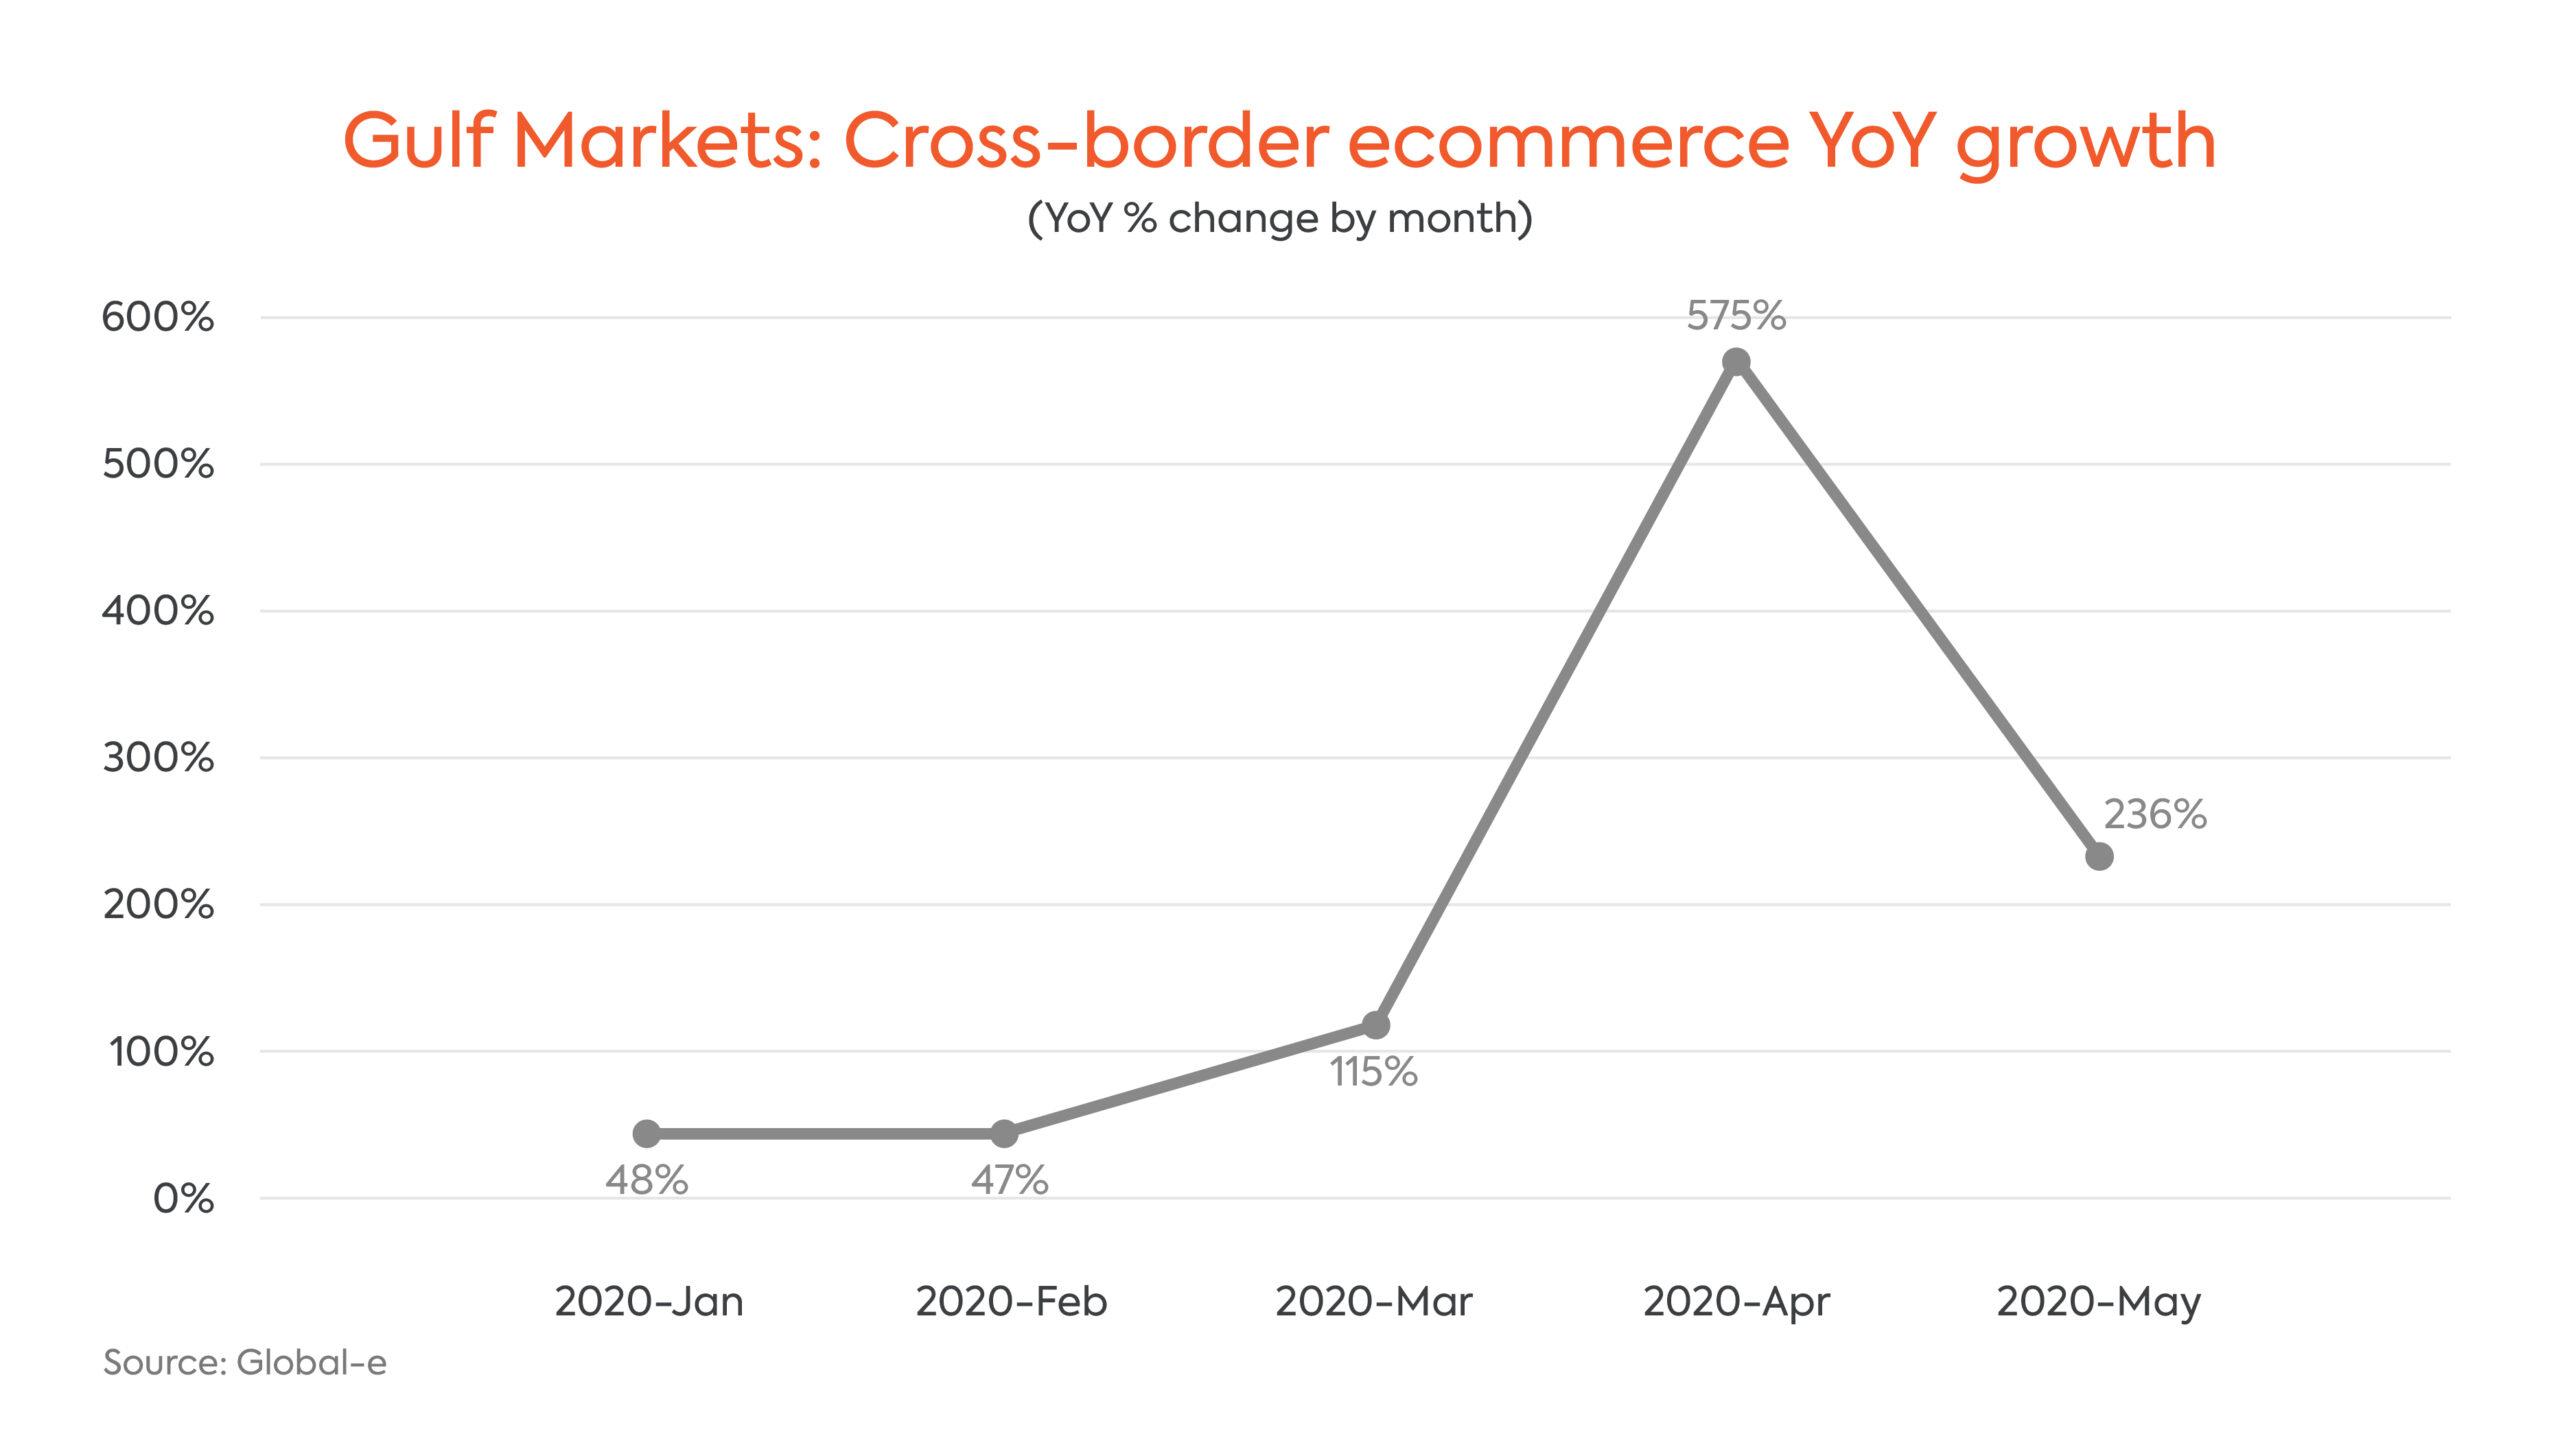 Global Cross Border eCommerce YOY Growth Gulf Markets